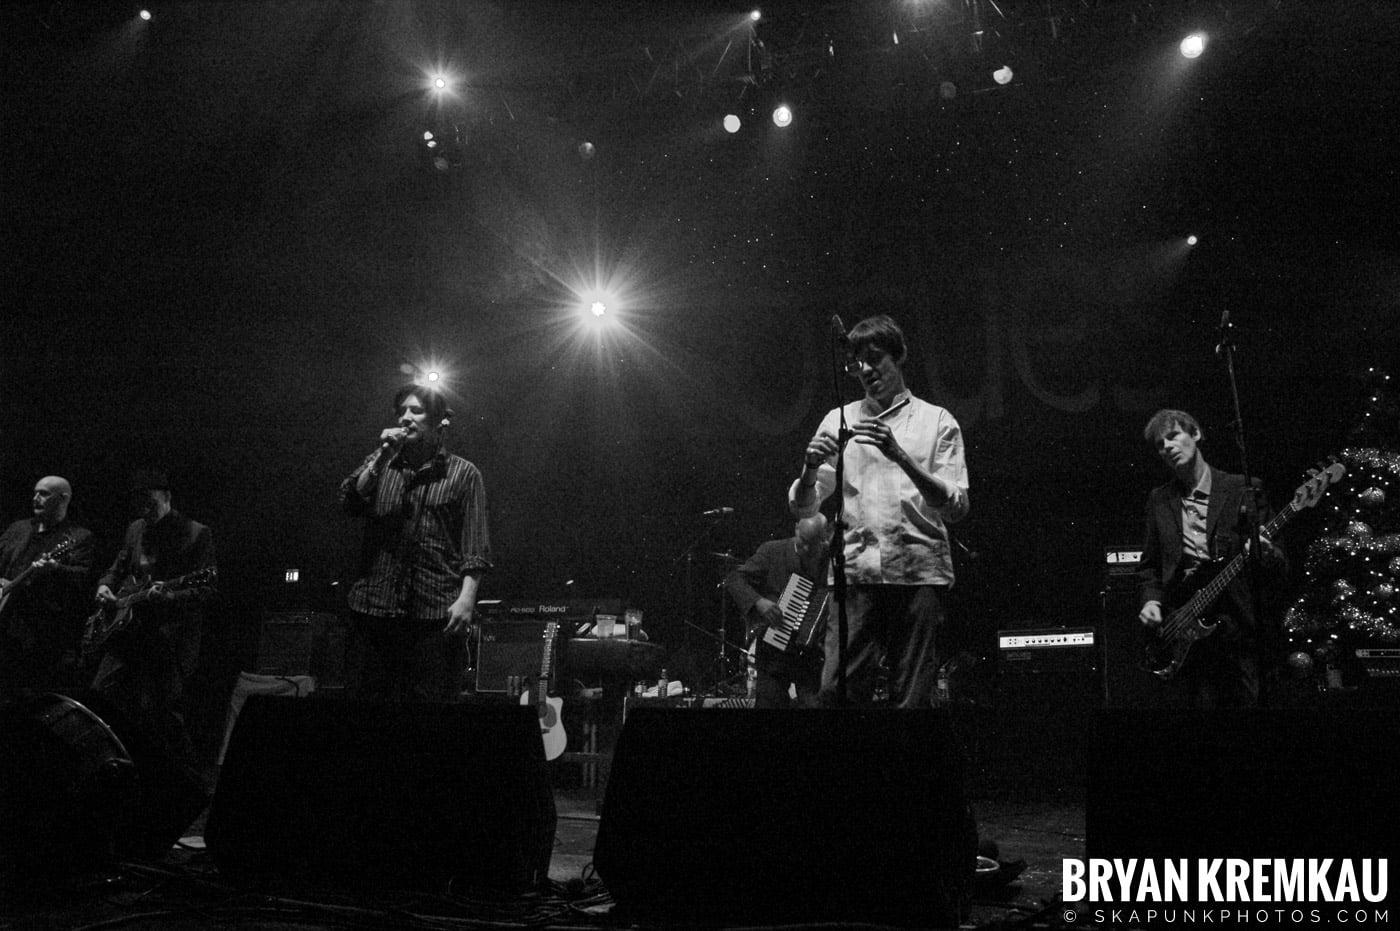 The Pogues @ Brixton Academy, London UK - 12.19.05 (8)